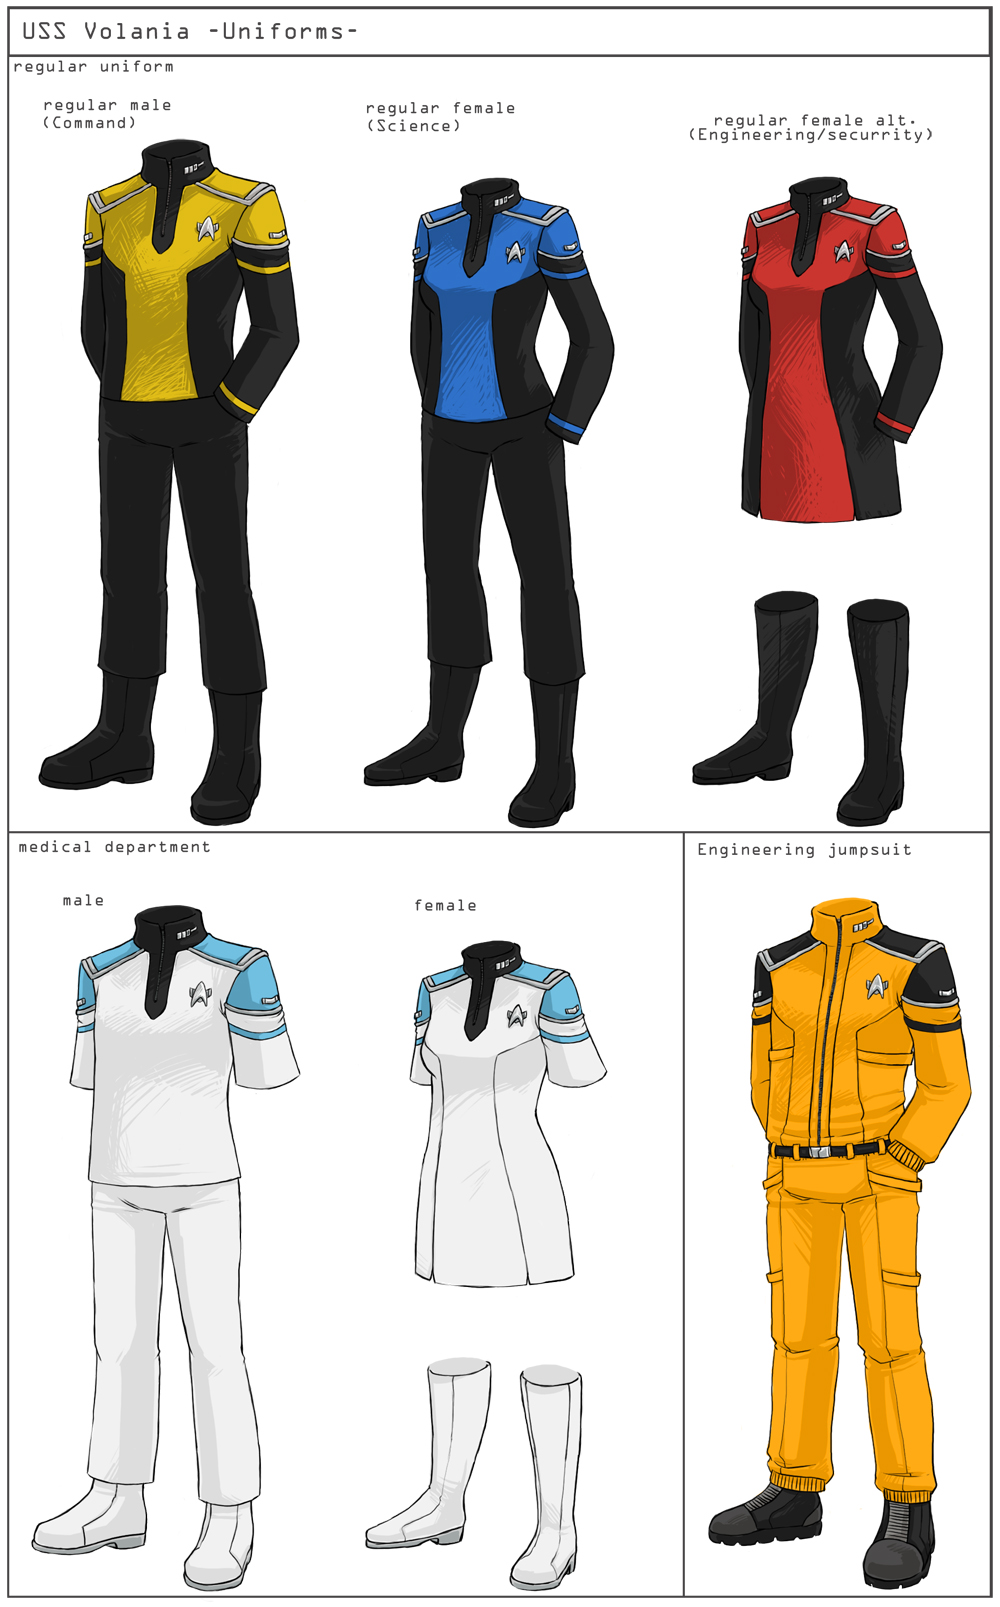 ST Uniforms Concept By Nomnomroko On DeviantArt